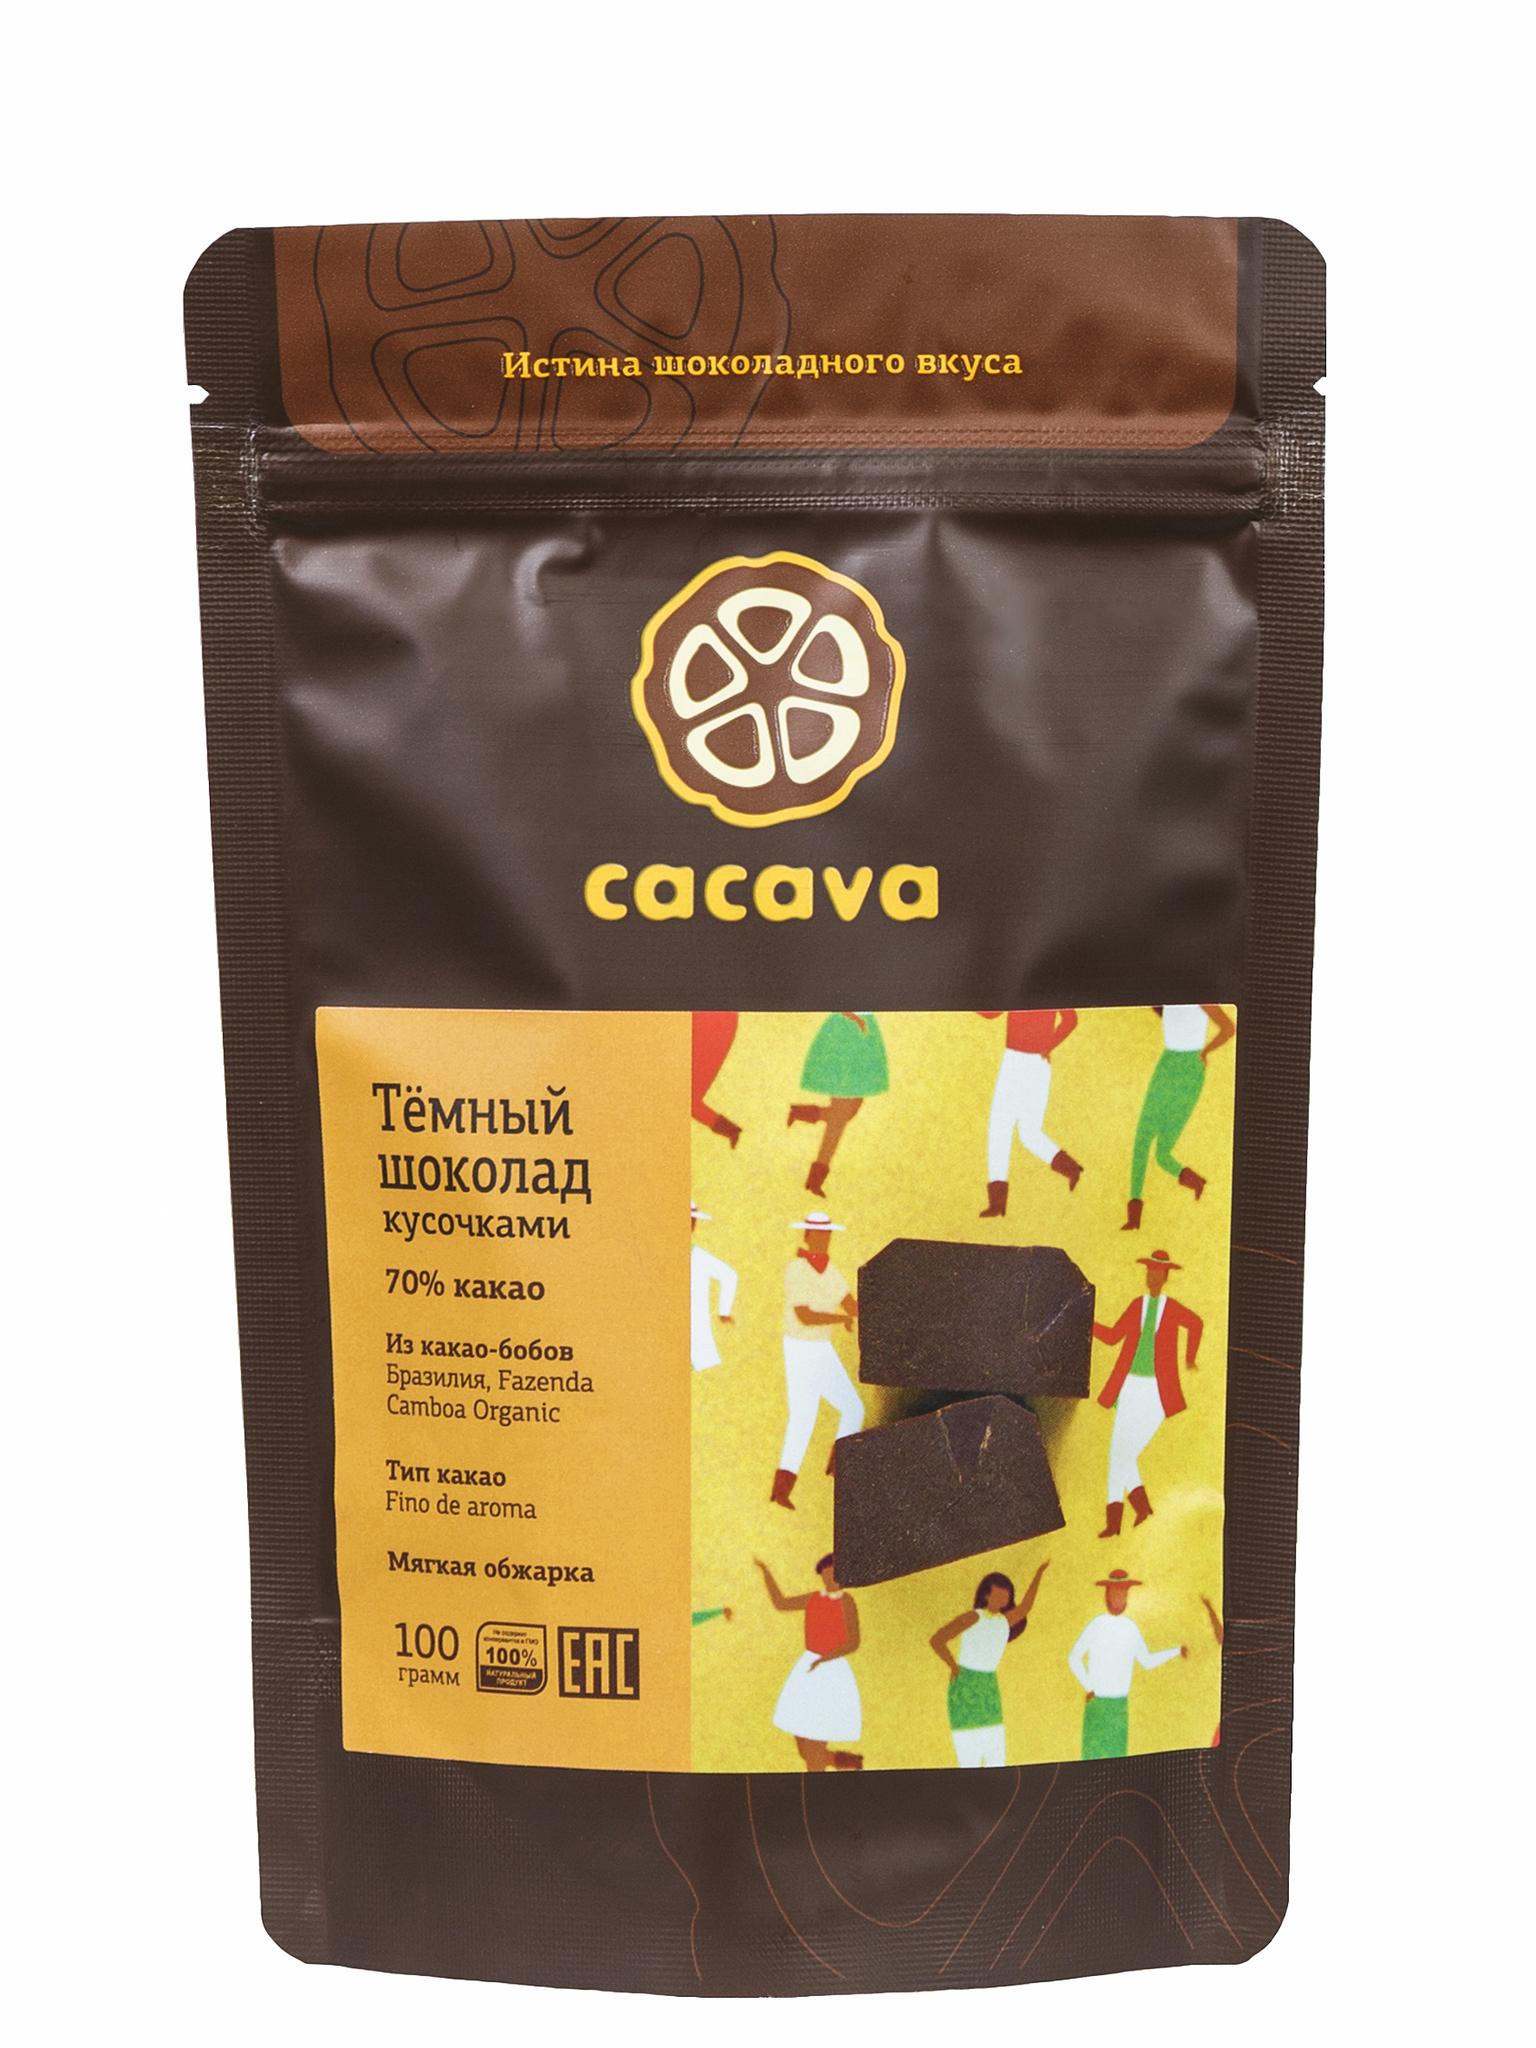 Тёмный шоколад 70 % какао (Бразилия, Fazenda Camboa), упаковка 100 грамм